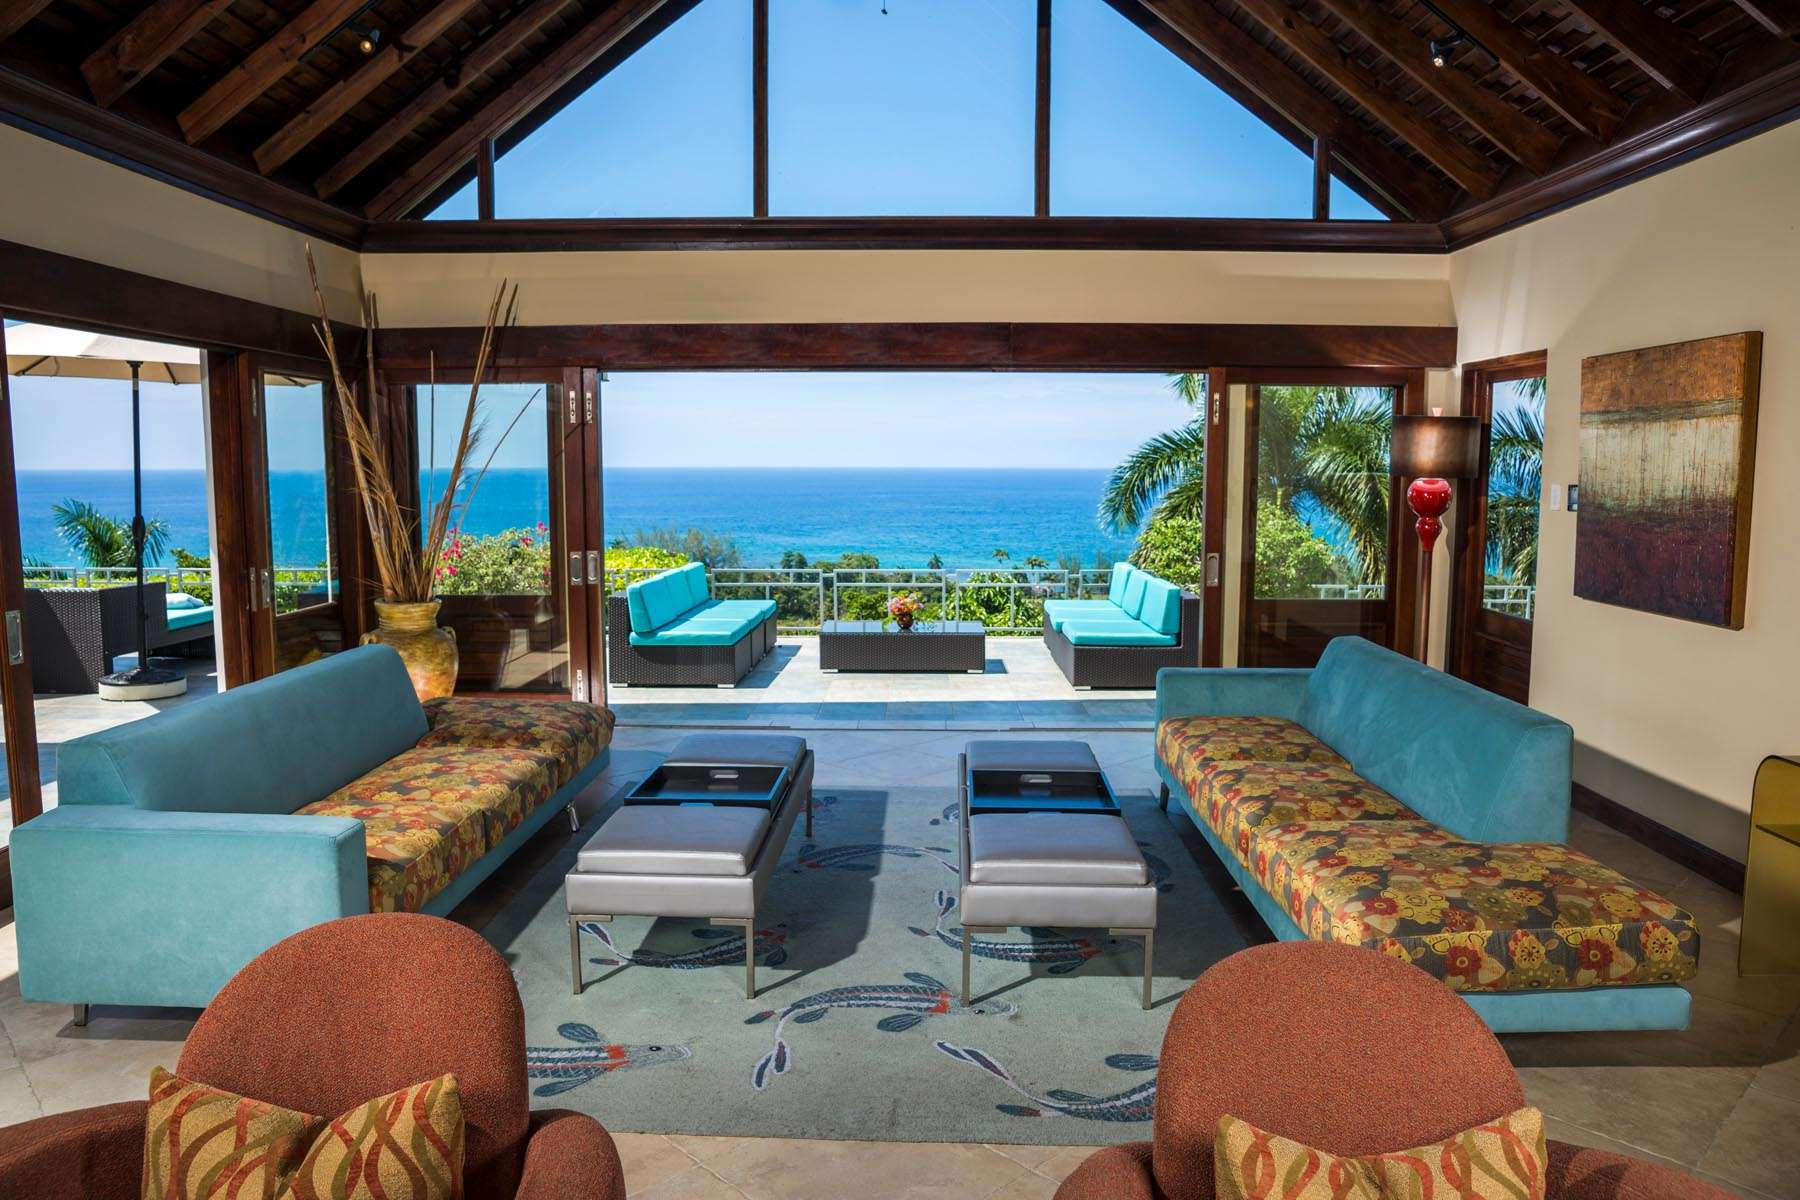 Luxury villa rentals caribbean - Jamaica - Try all club - No location 4 - Anticipation - Image 1/11